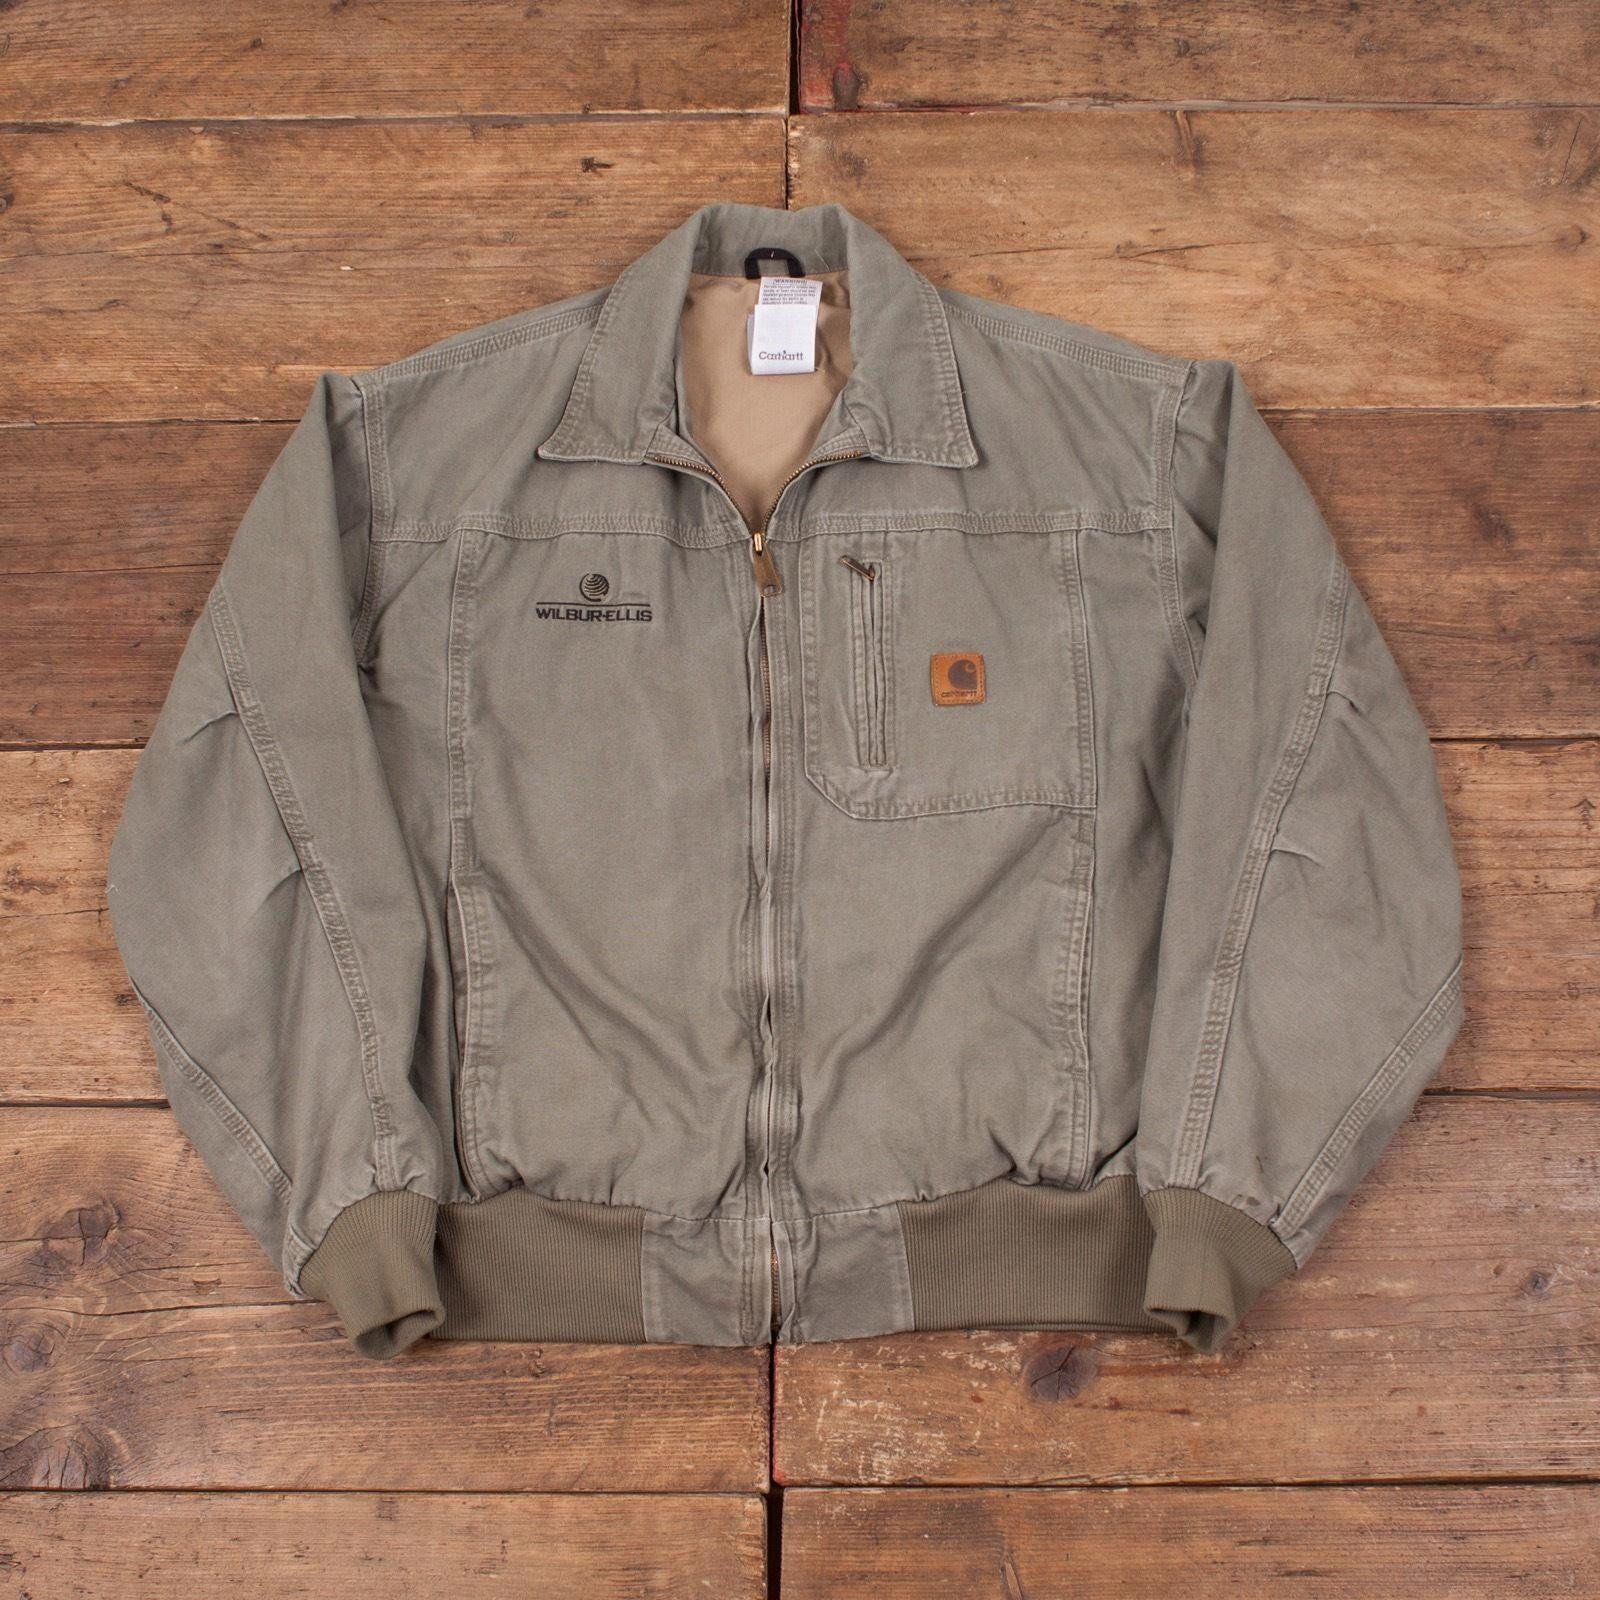 Mens Vintage Zip Up Carhartt Lined Workwear Green Jacket Size L 44 R4256 For Sale Eur 41 51 See Pho Mens Zip Up Jackets Leather Jacket Men Carhartt Jacket [ 1600 x 1600 Pixel ]